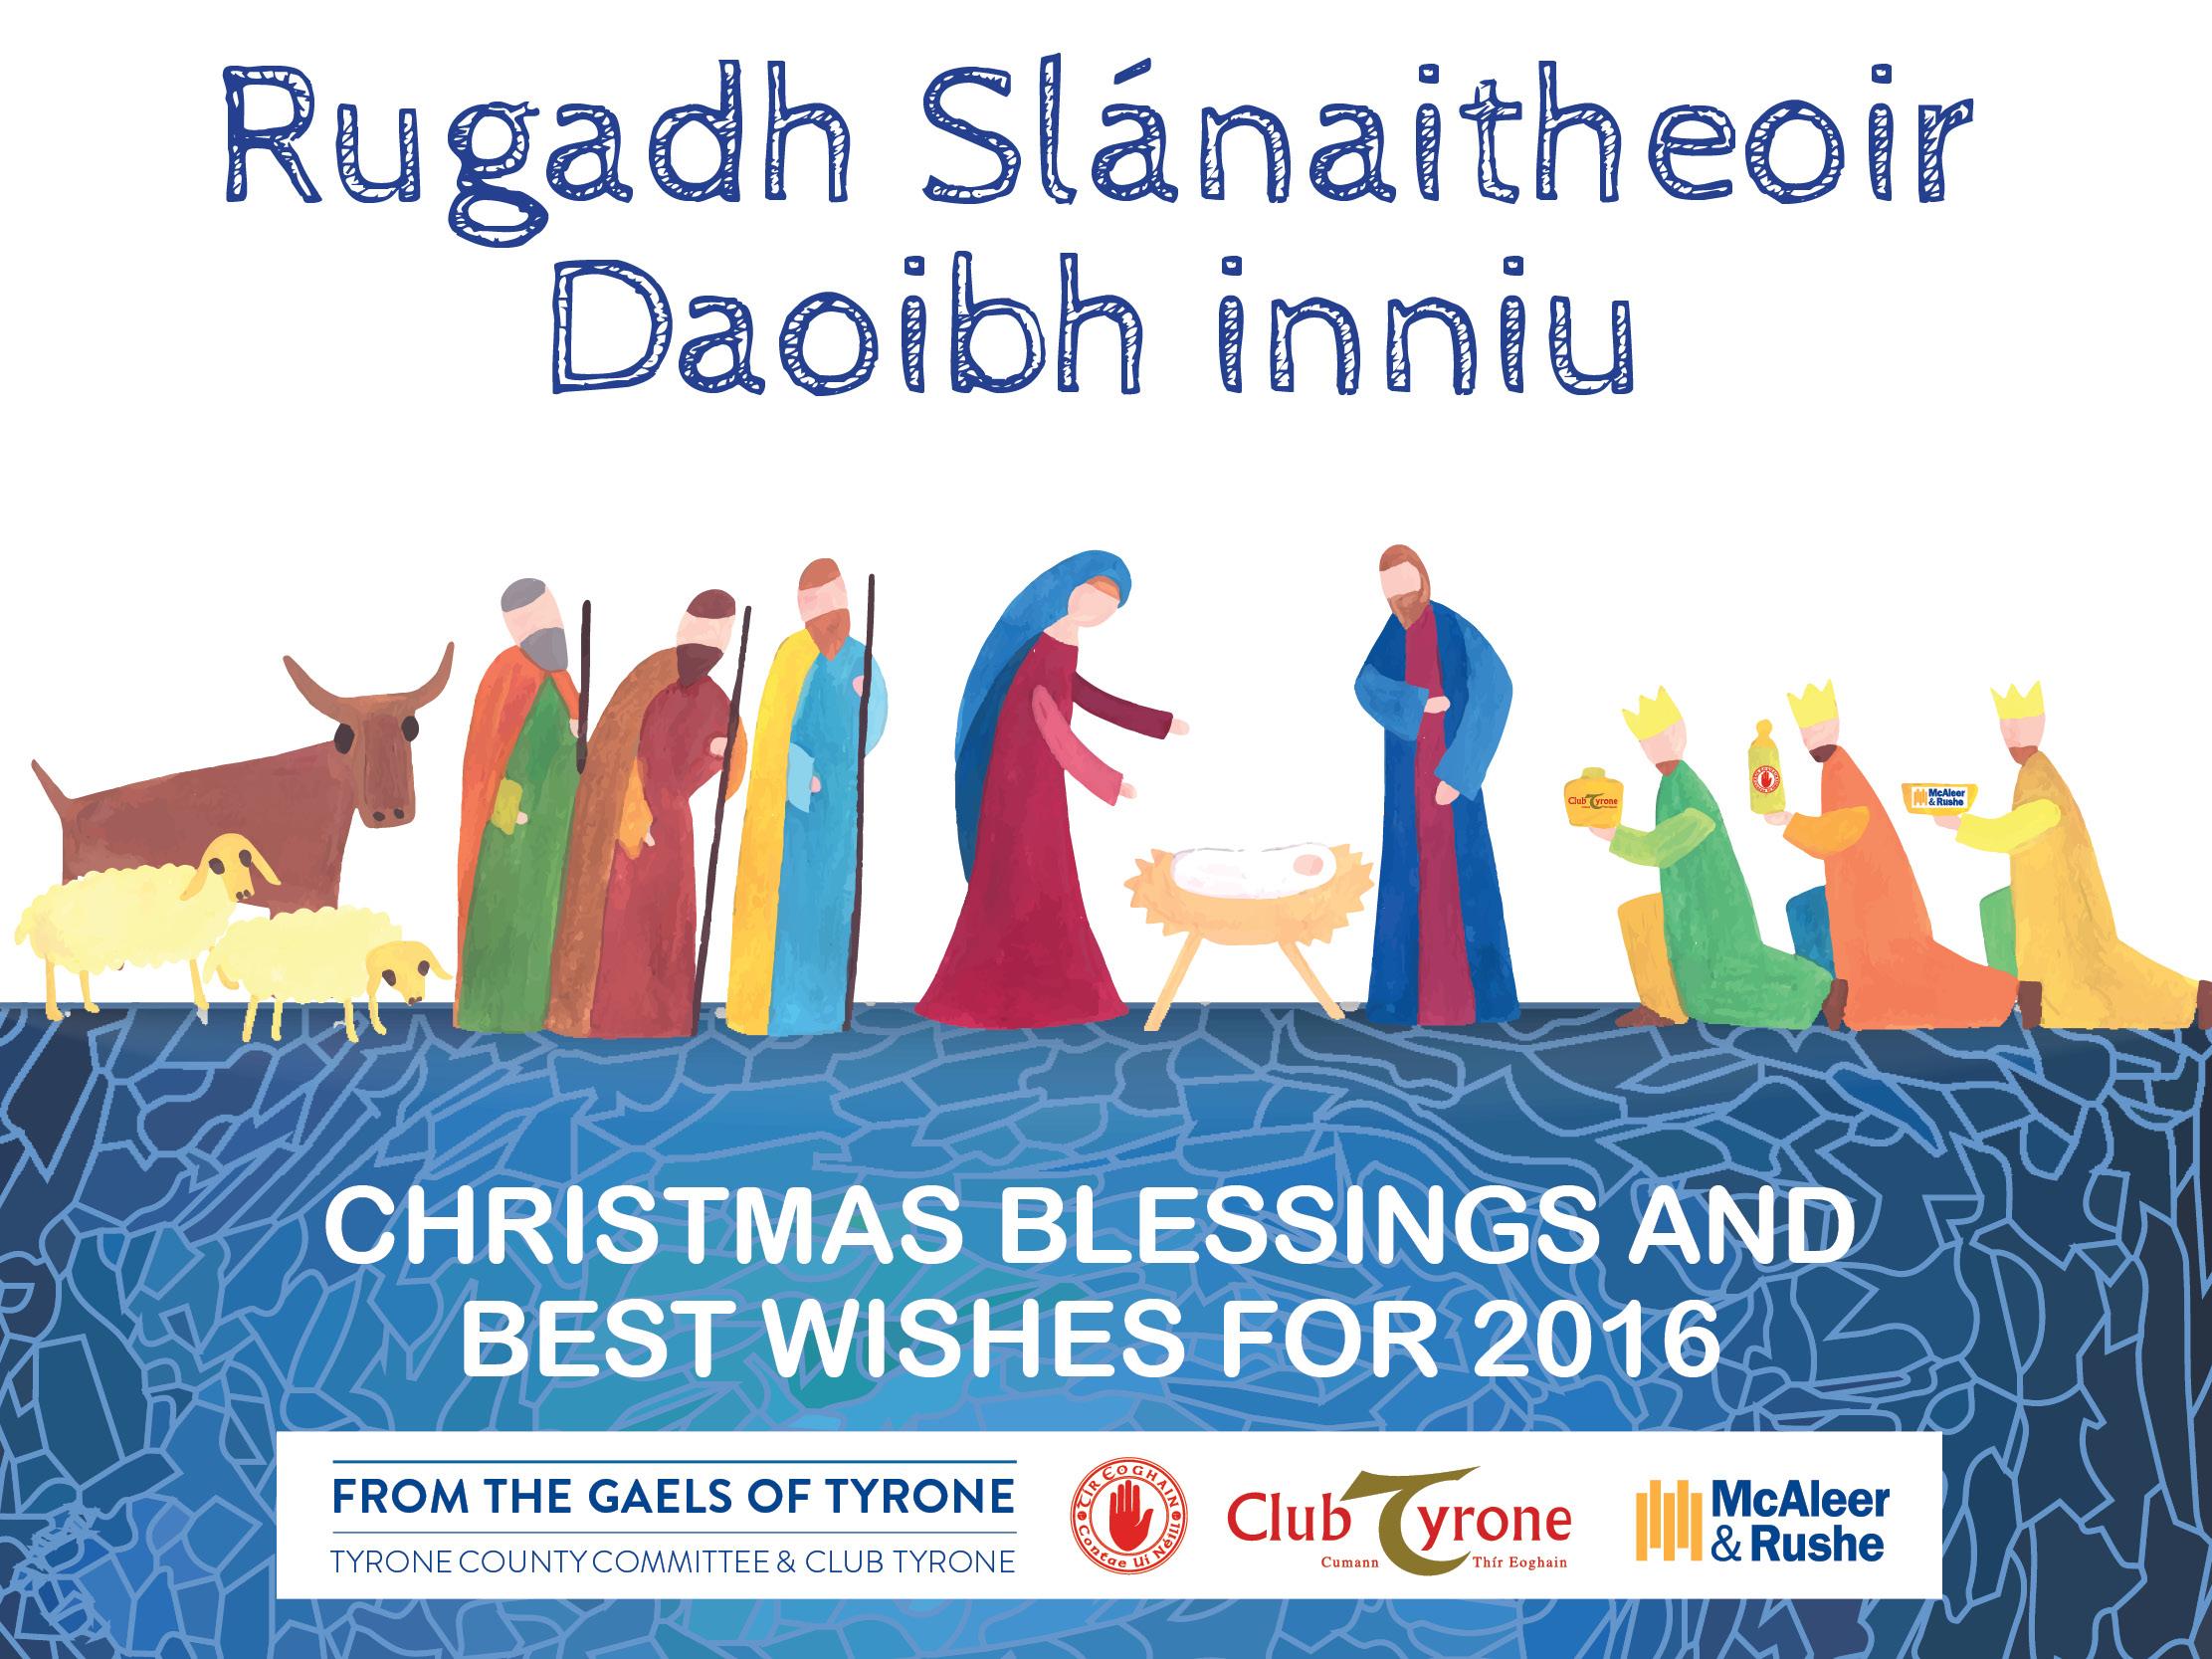 Nollaig Shona Daoibh from Tyrone GAA!